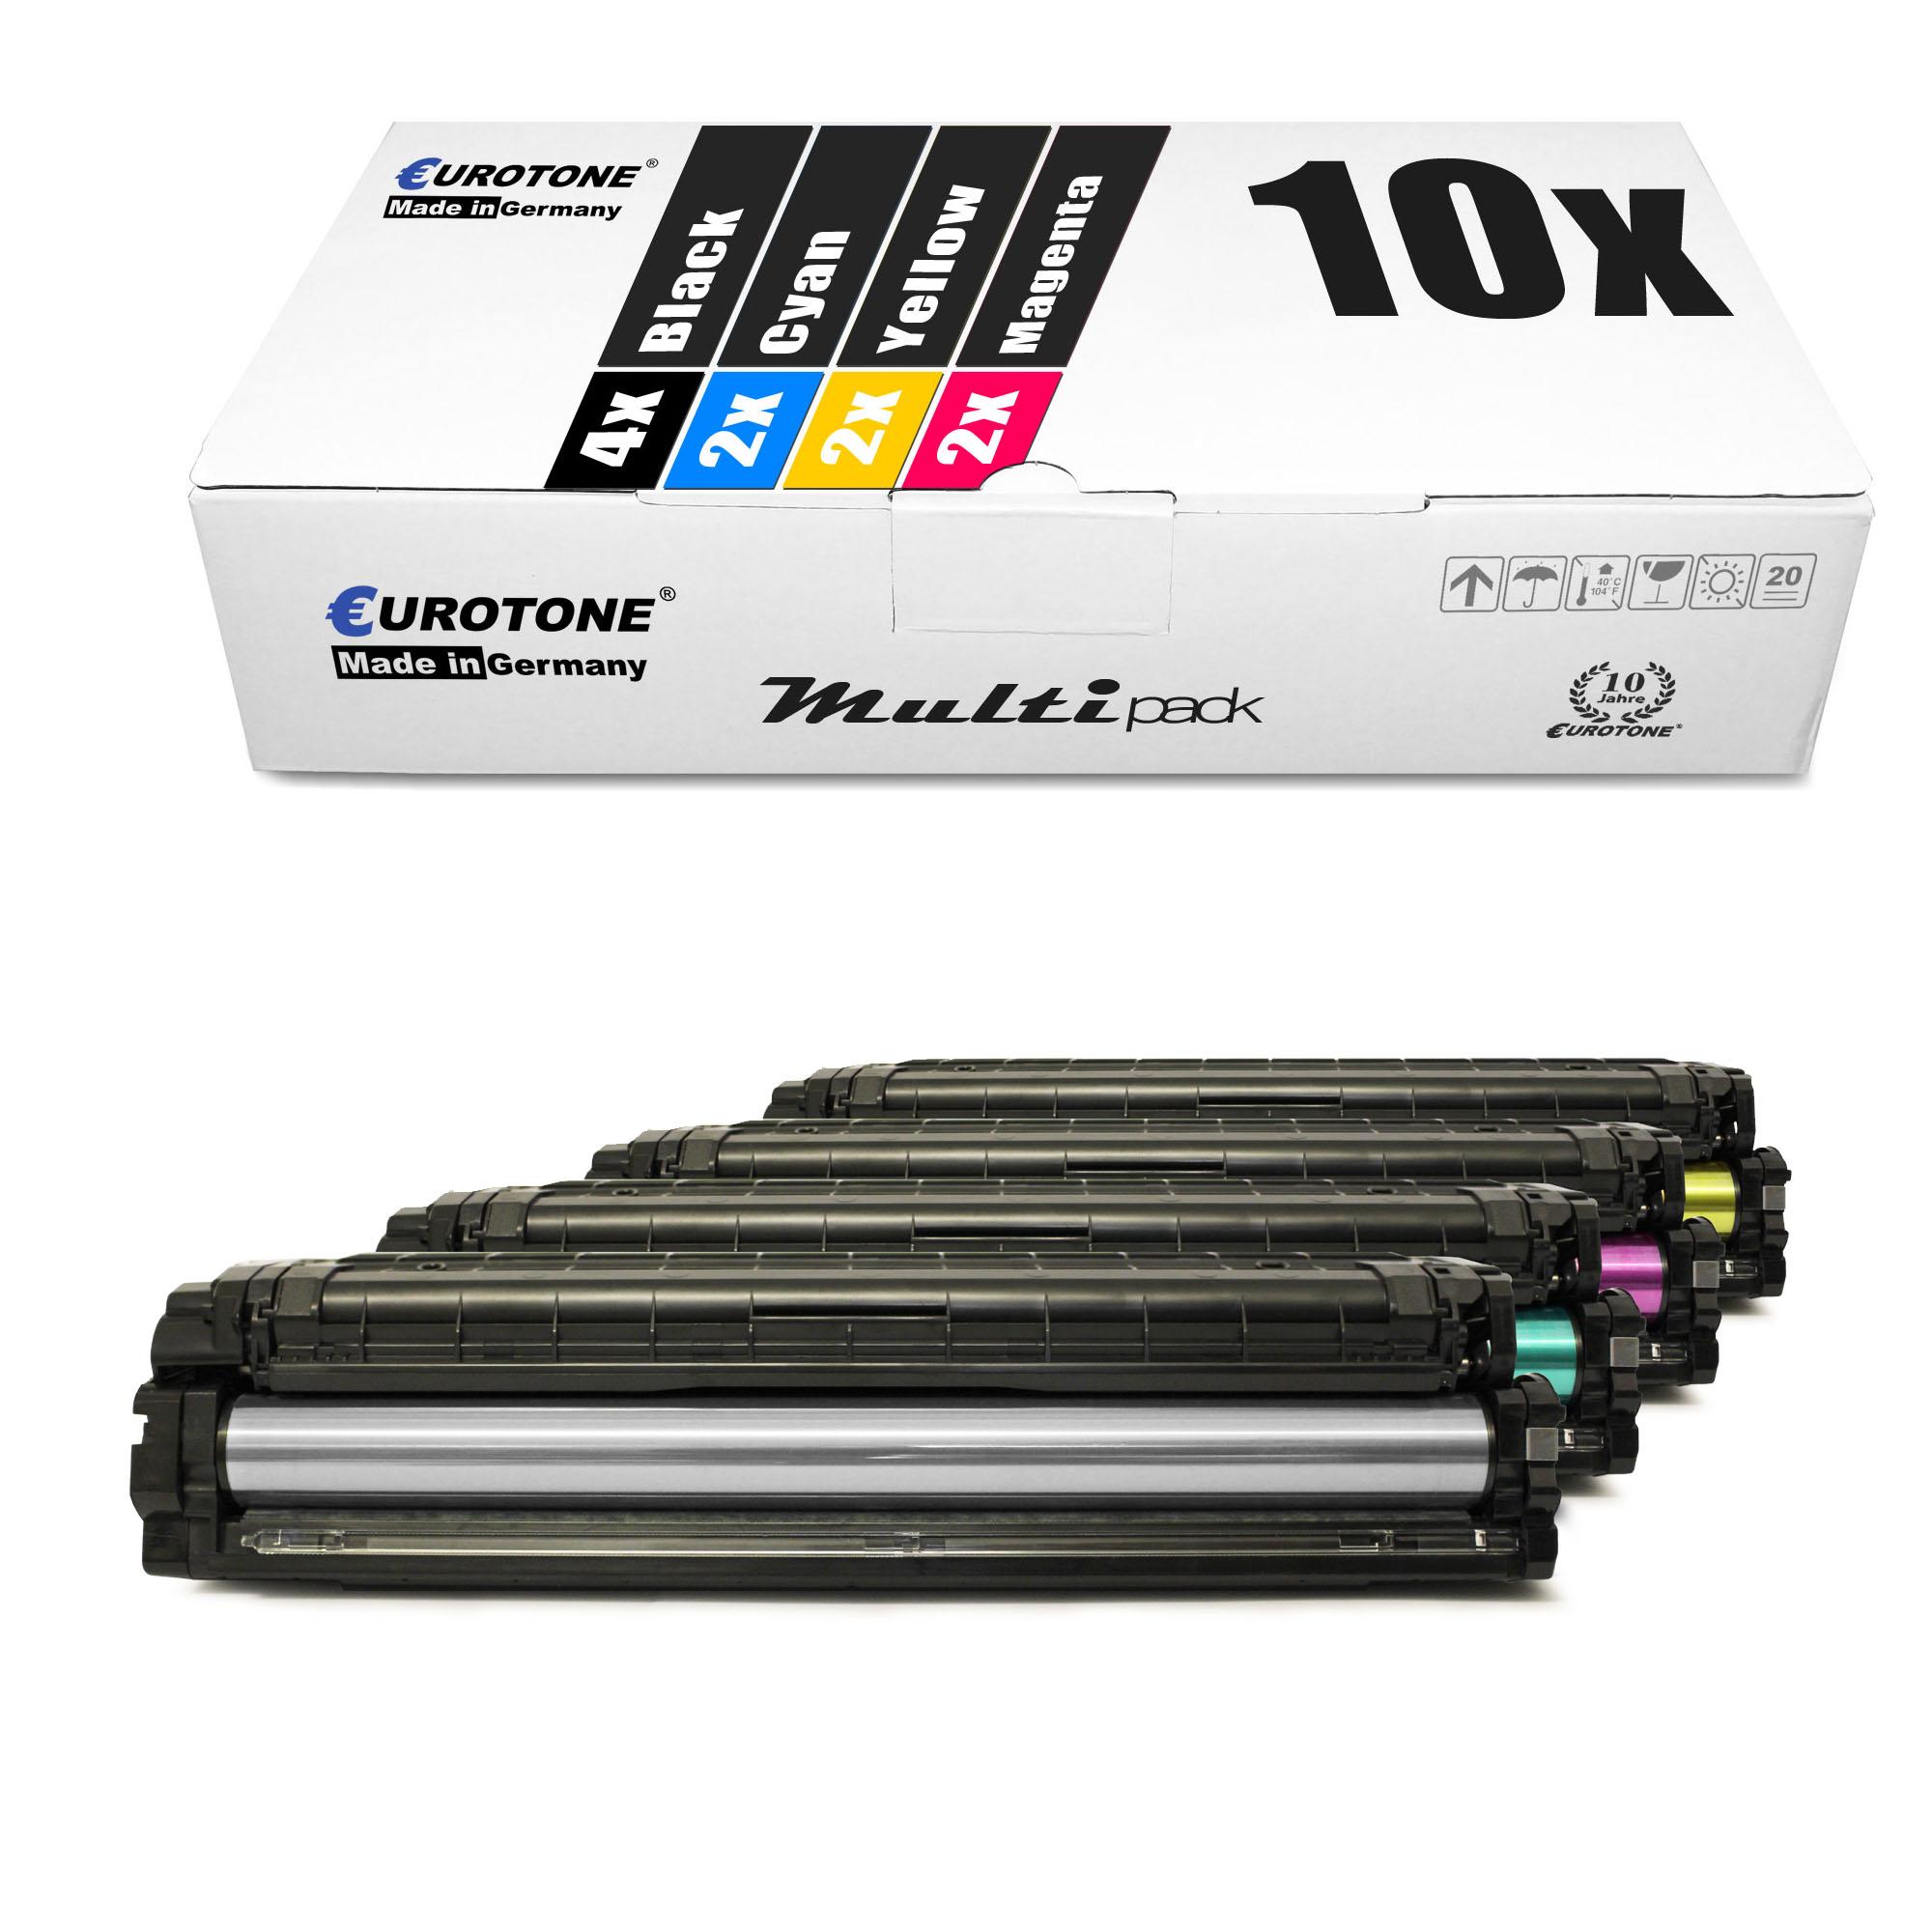 10x PRO Toner für Samsung CLP-680-ND CLX-6260-ND CLX-6260-FW CLX-6260-FD